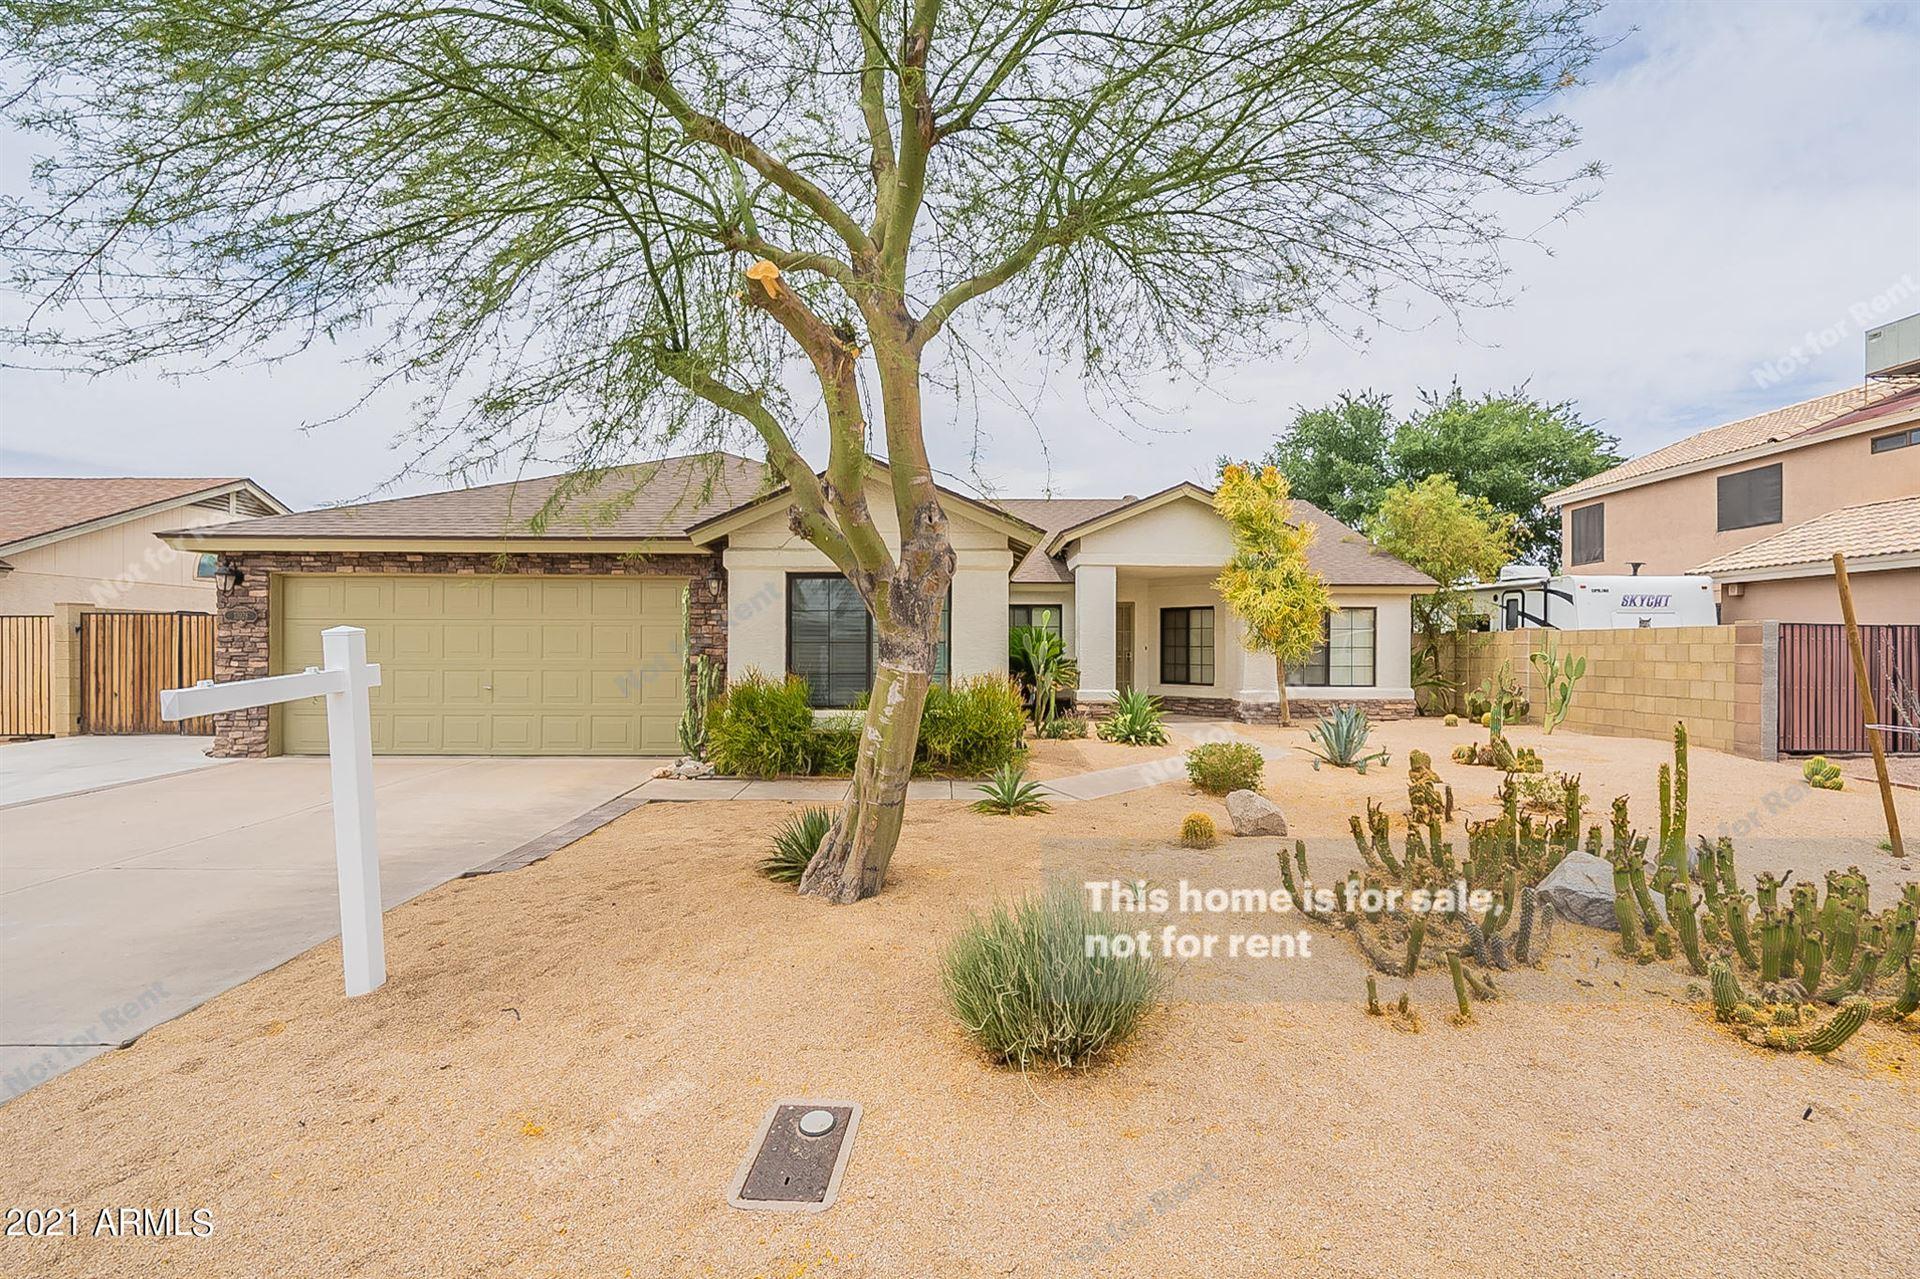 13928 N 78TH Avenue, Peoria, AZ 85381 - MLS#: 6241596